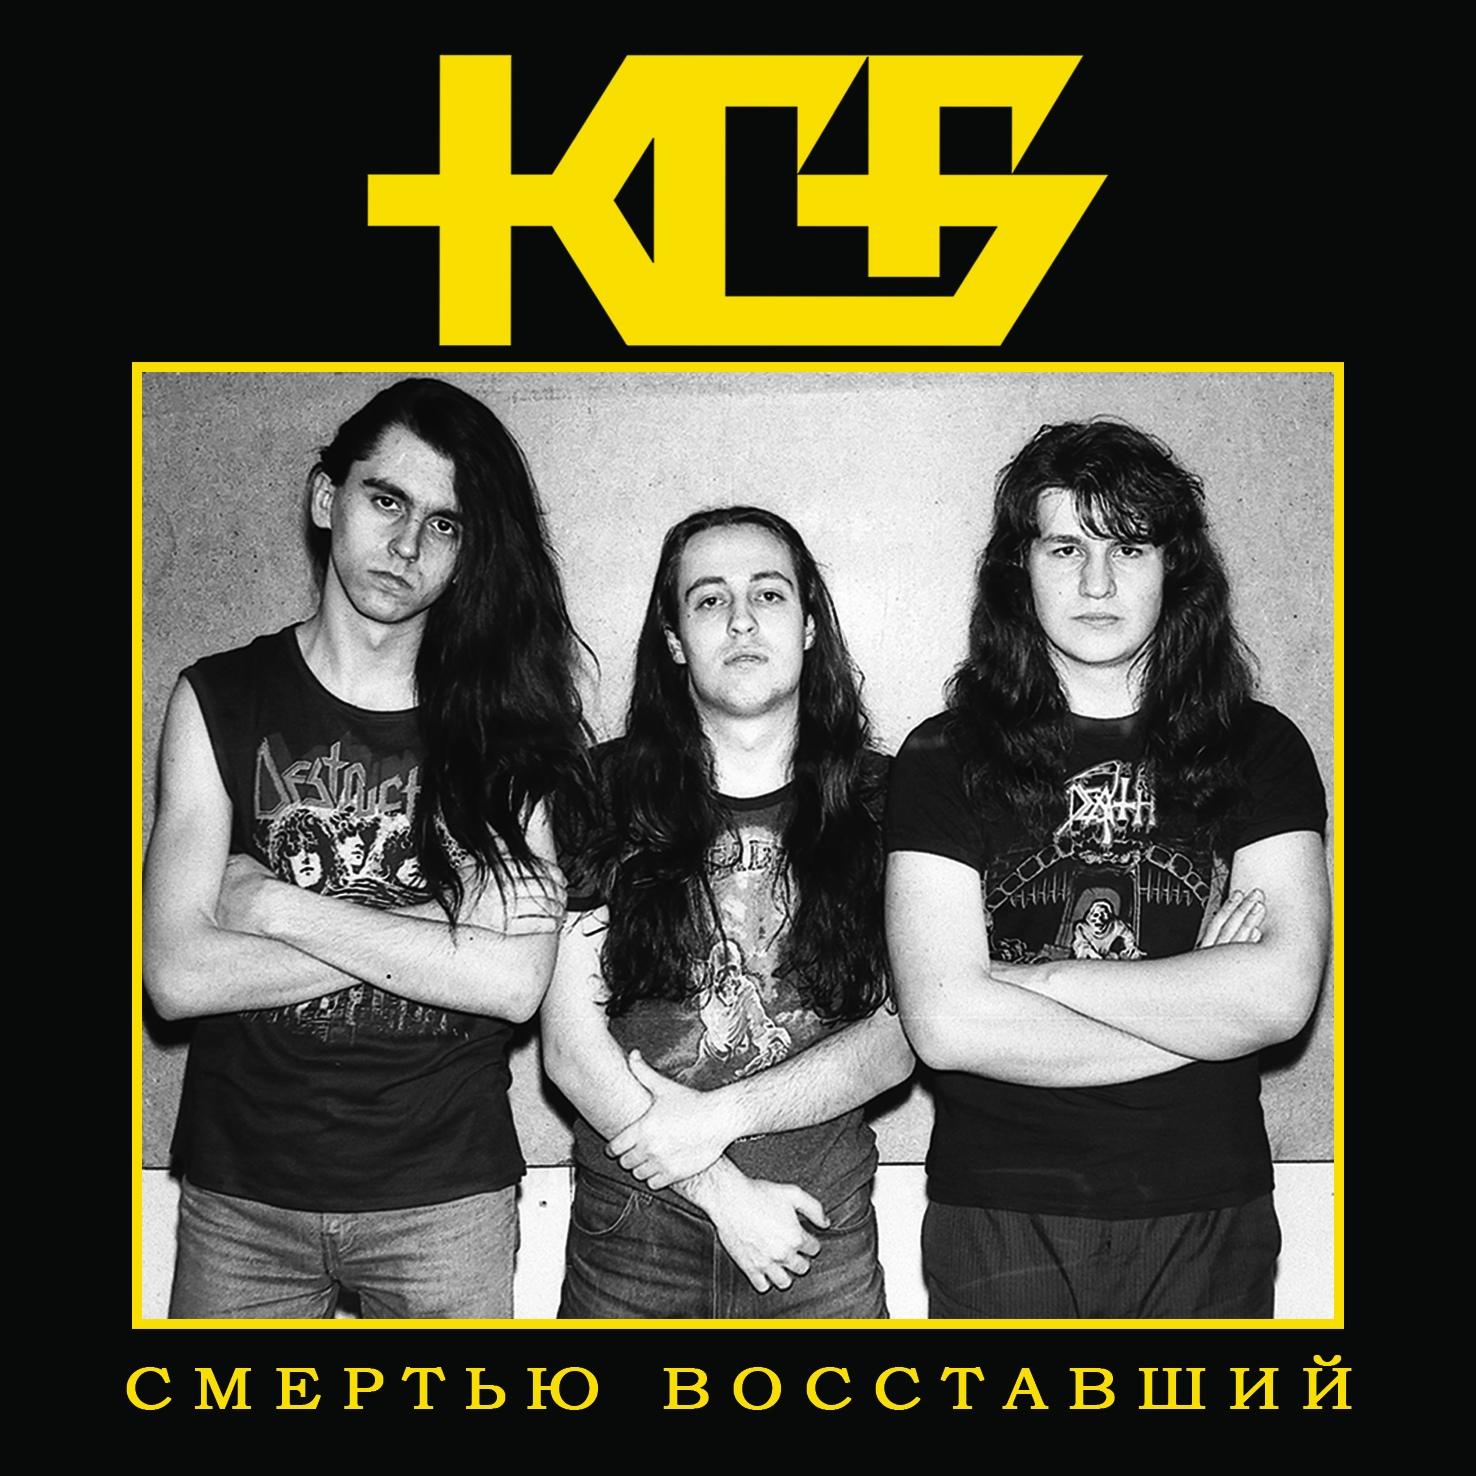 КГБ - Смертью Восставший - Slipcase - pre-sale